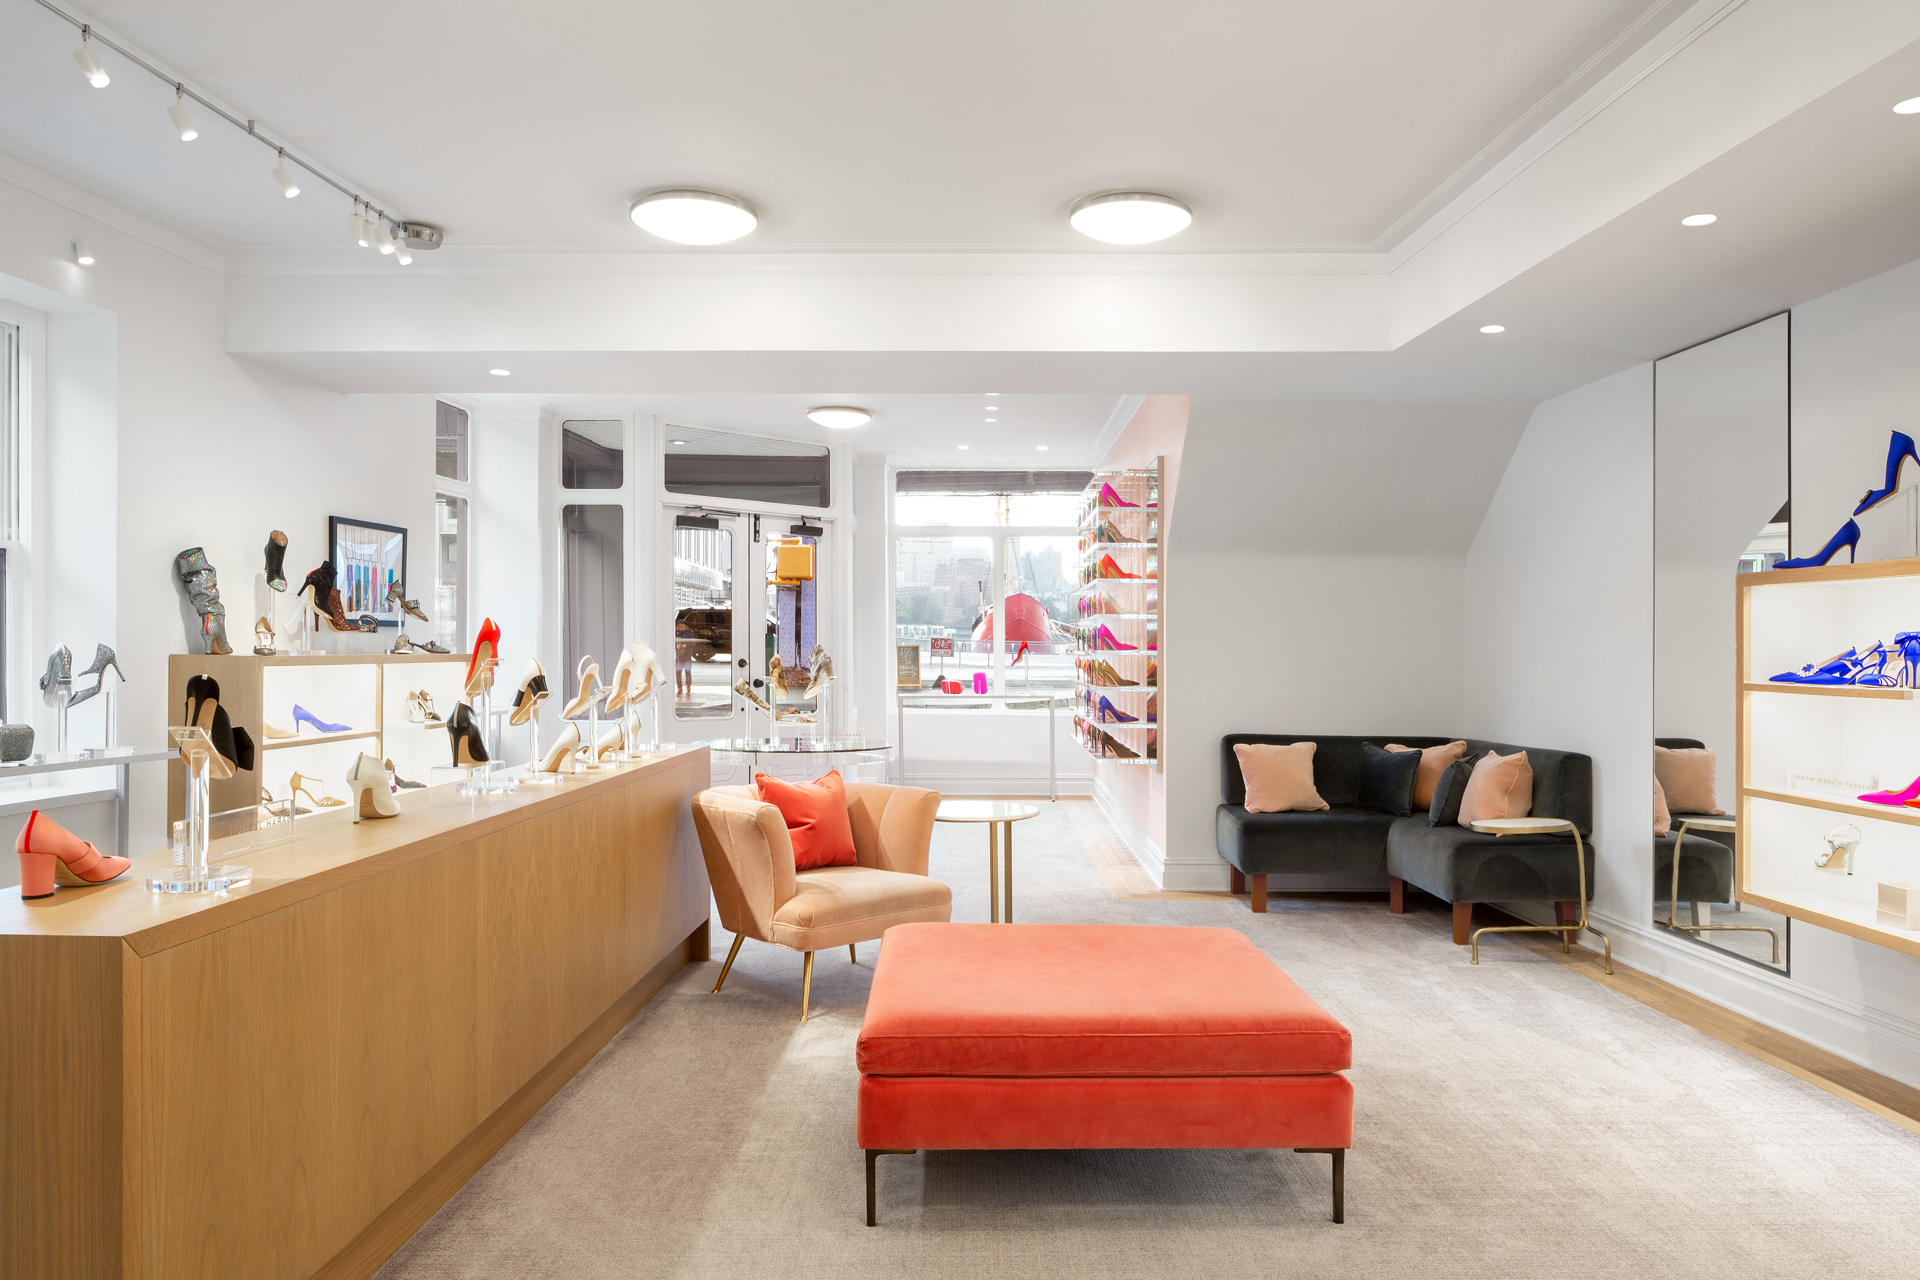 SJP by Sarah Jessica Parker retails store decor ideas